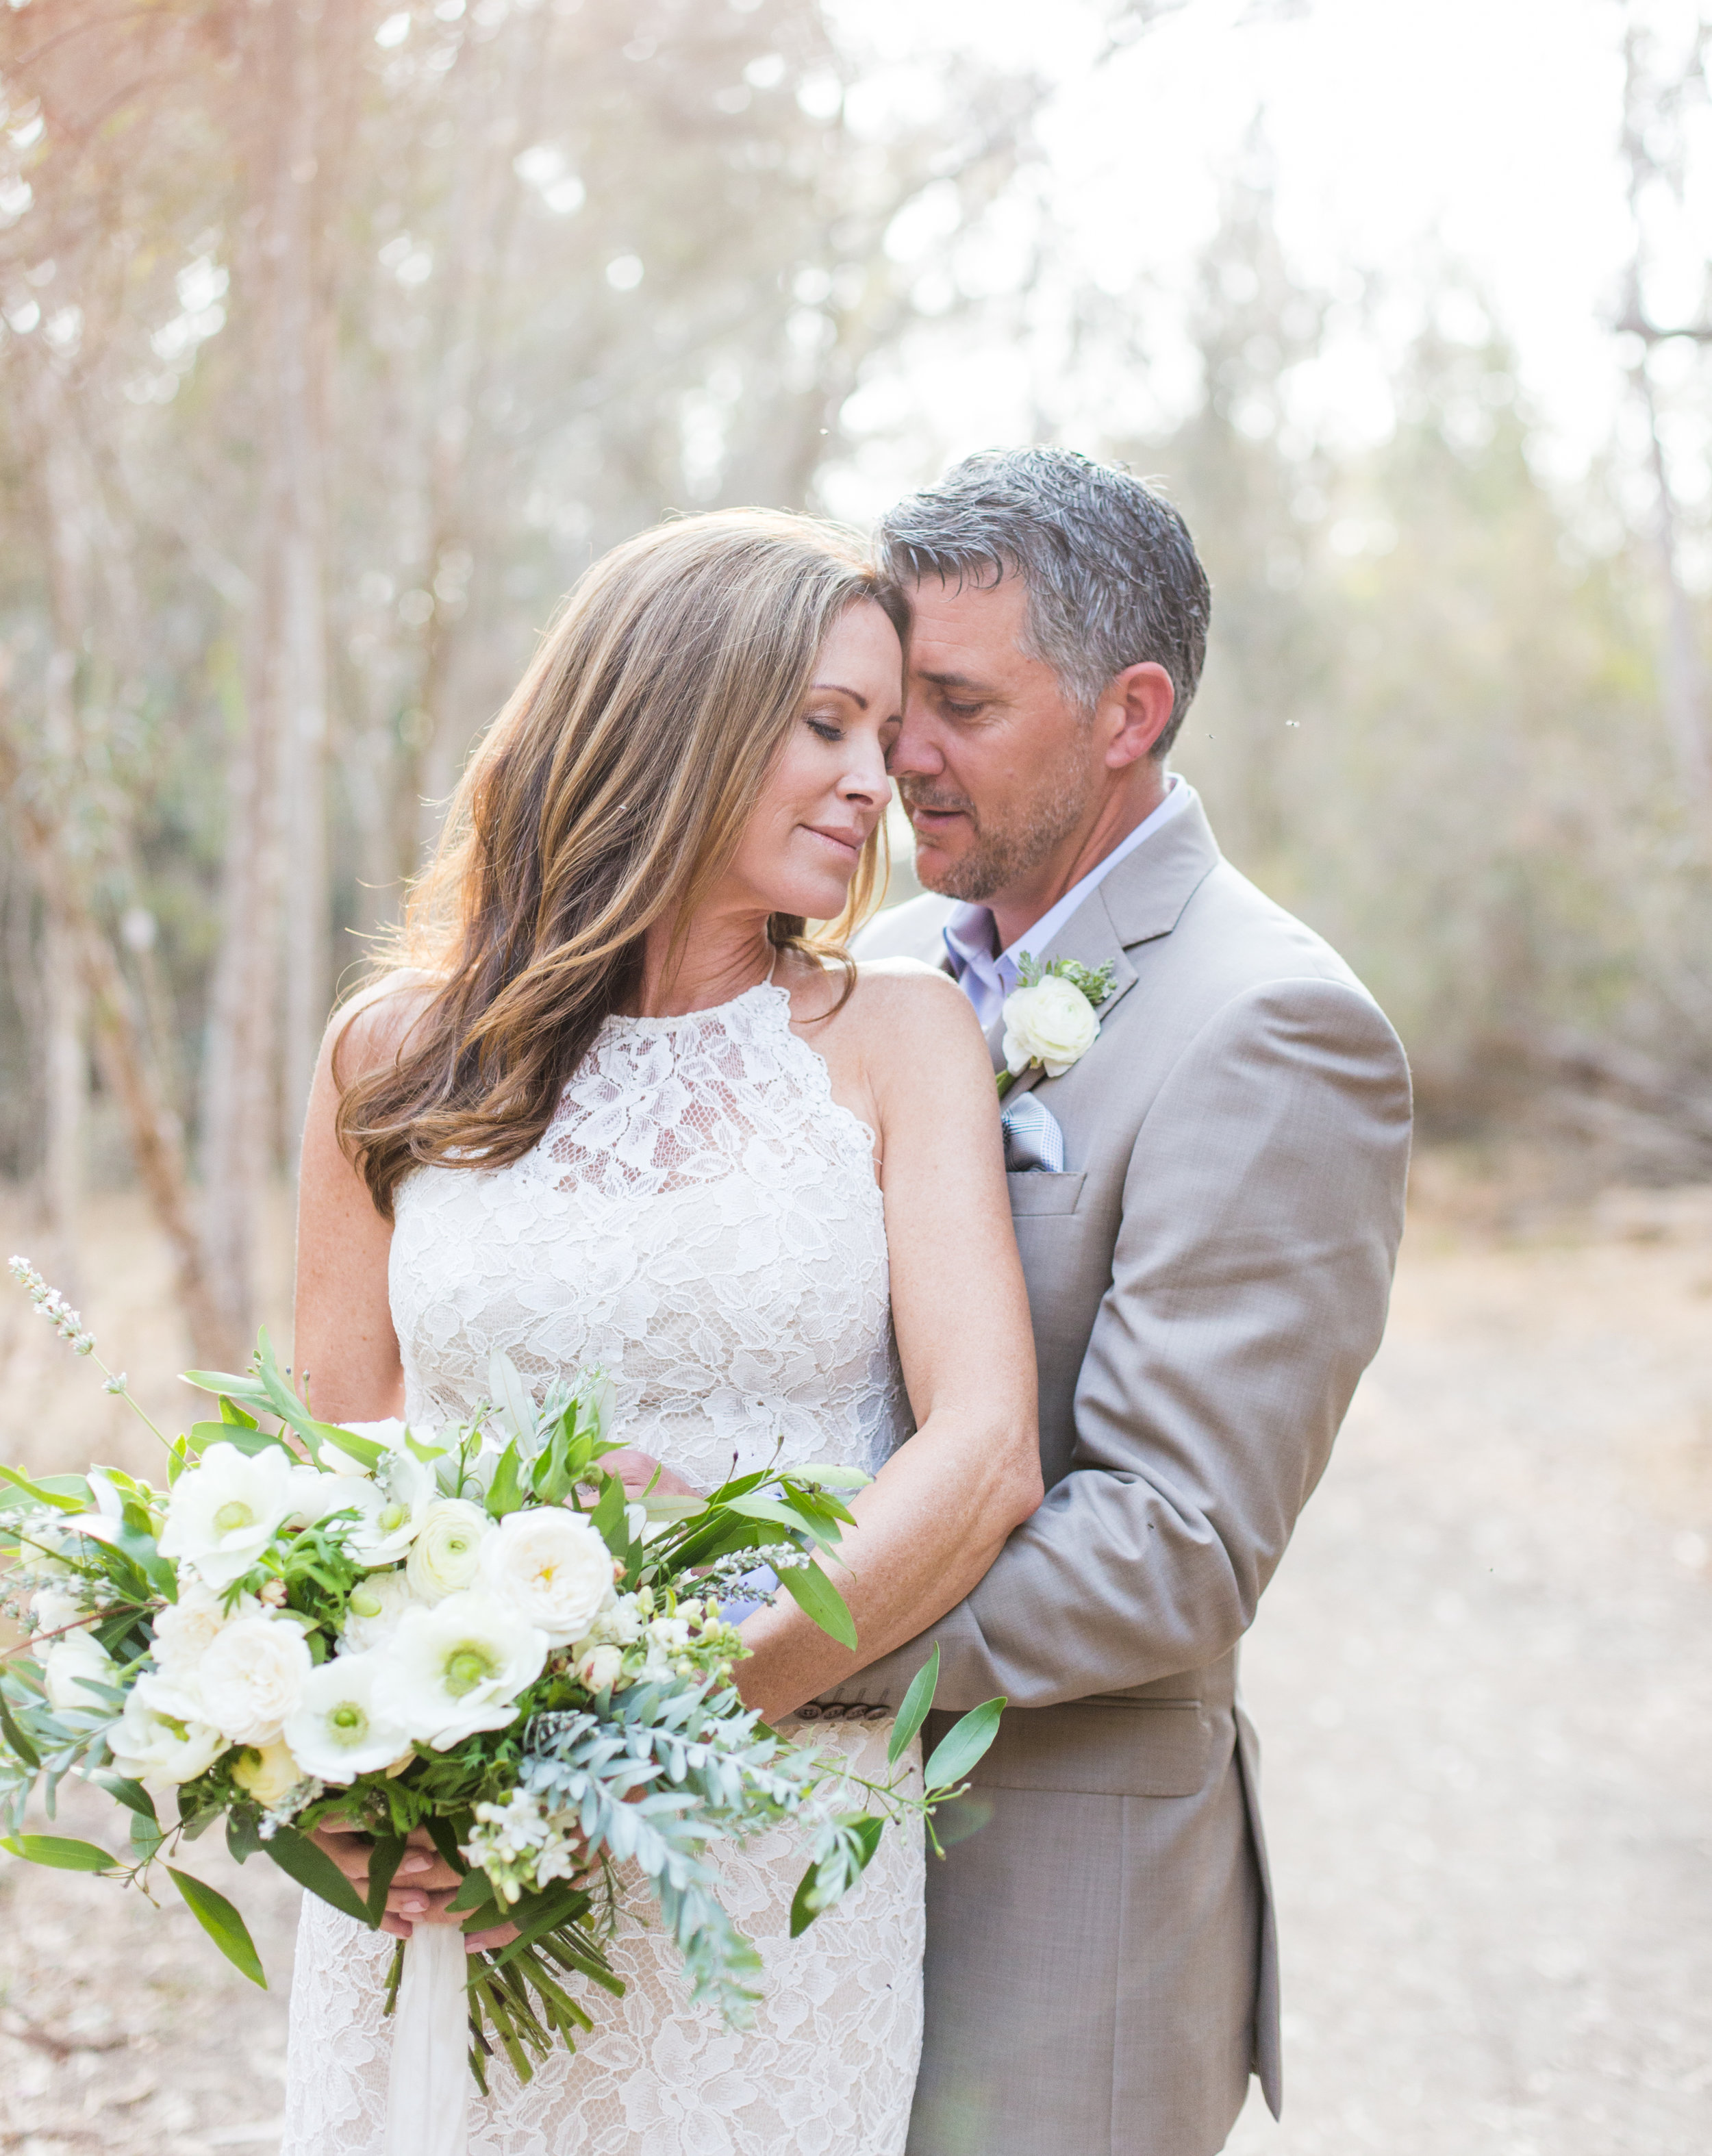 santa-barbara-elopement-elope-wedding-planner-coordinator-coordination-day-of-intimate-rustic-ellwood-bluffs-forest-beach-ocean-view-green-white-event (3).jpg